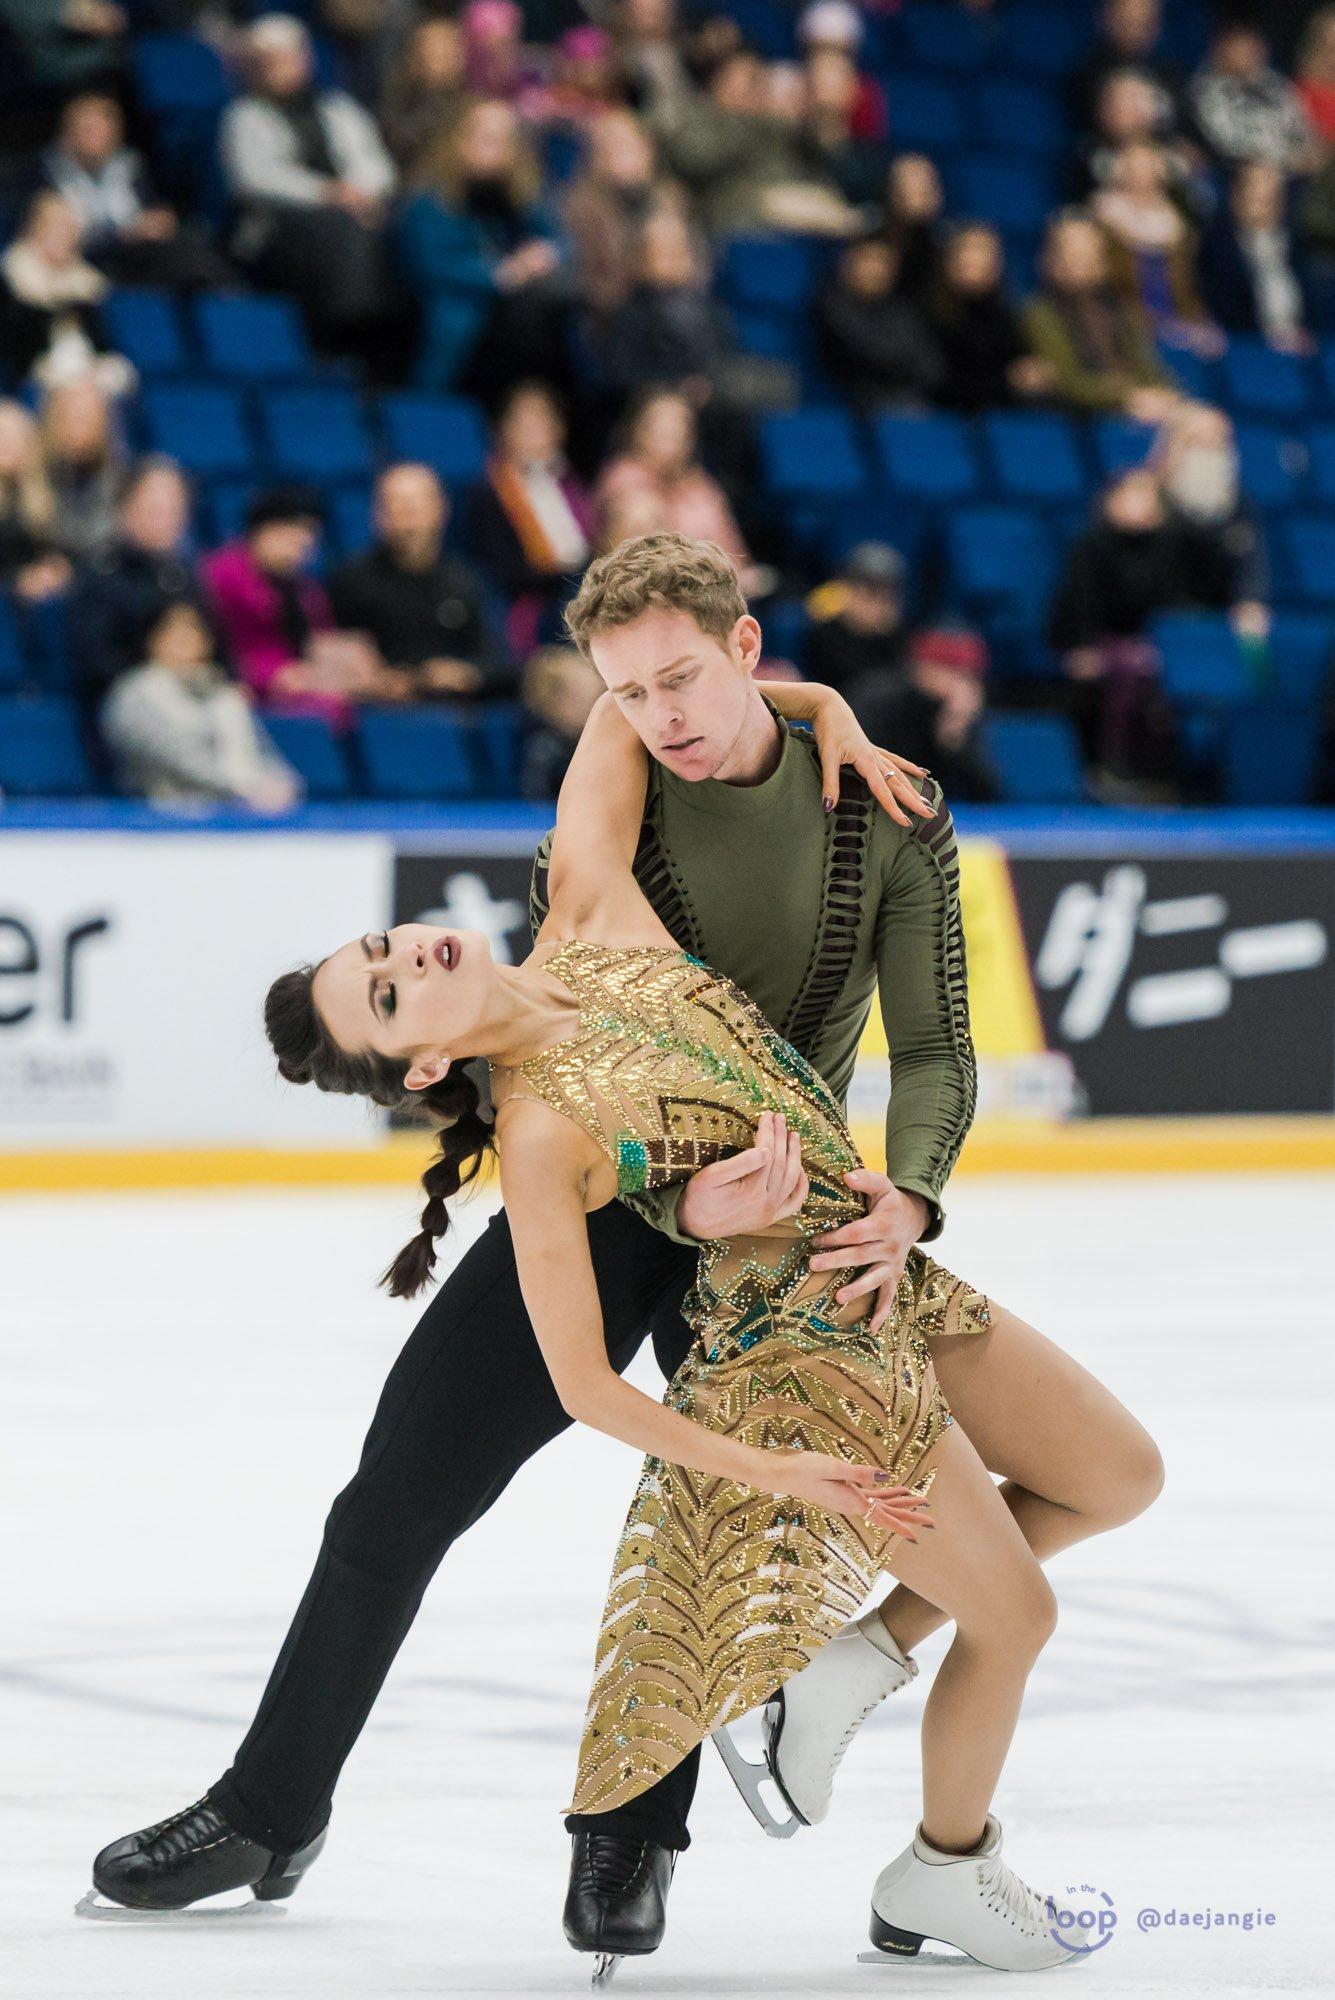 Challenger (6) - Finlandia Trophy. Oct 11 - 13, 2019. Espoo /FIN      - Страница 13 EG3MAiNX4Ac9QXO?format=jpg&name=large